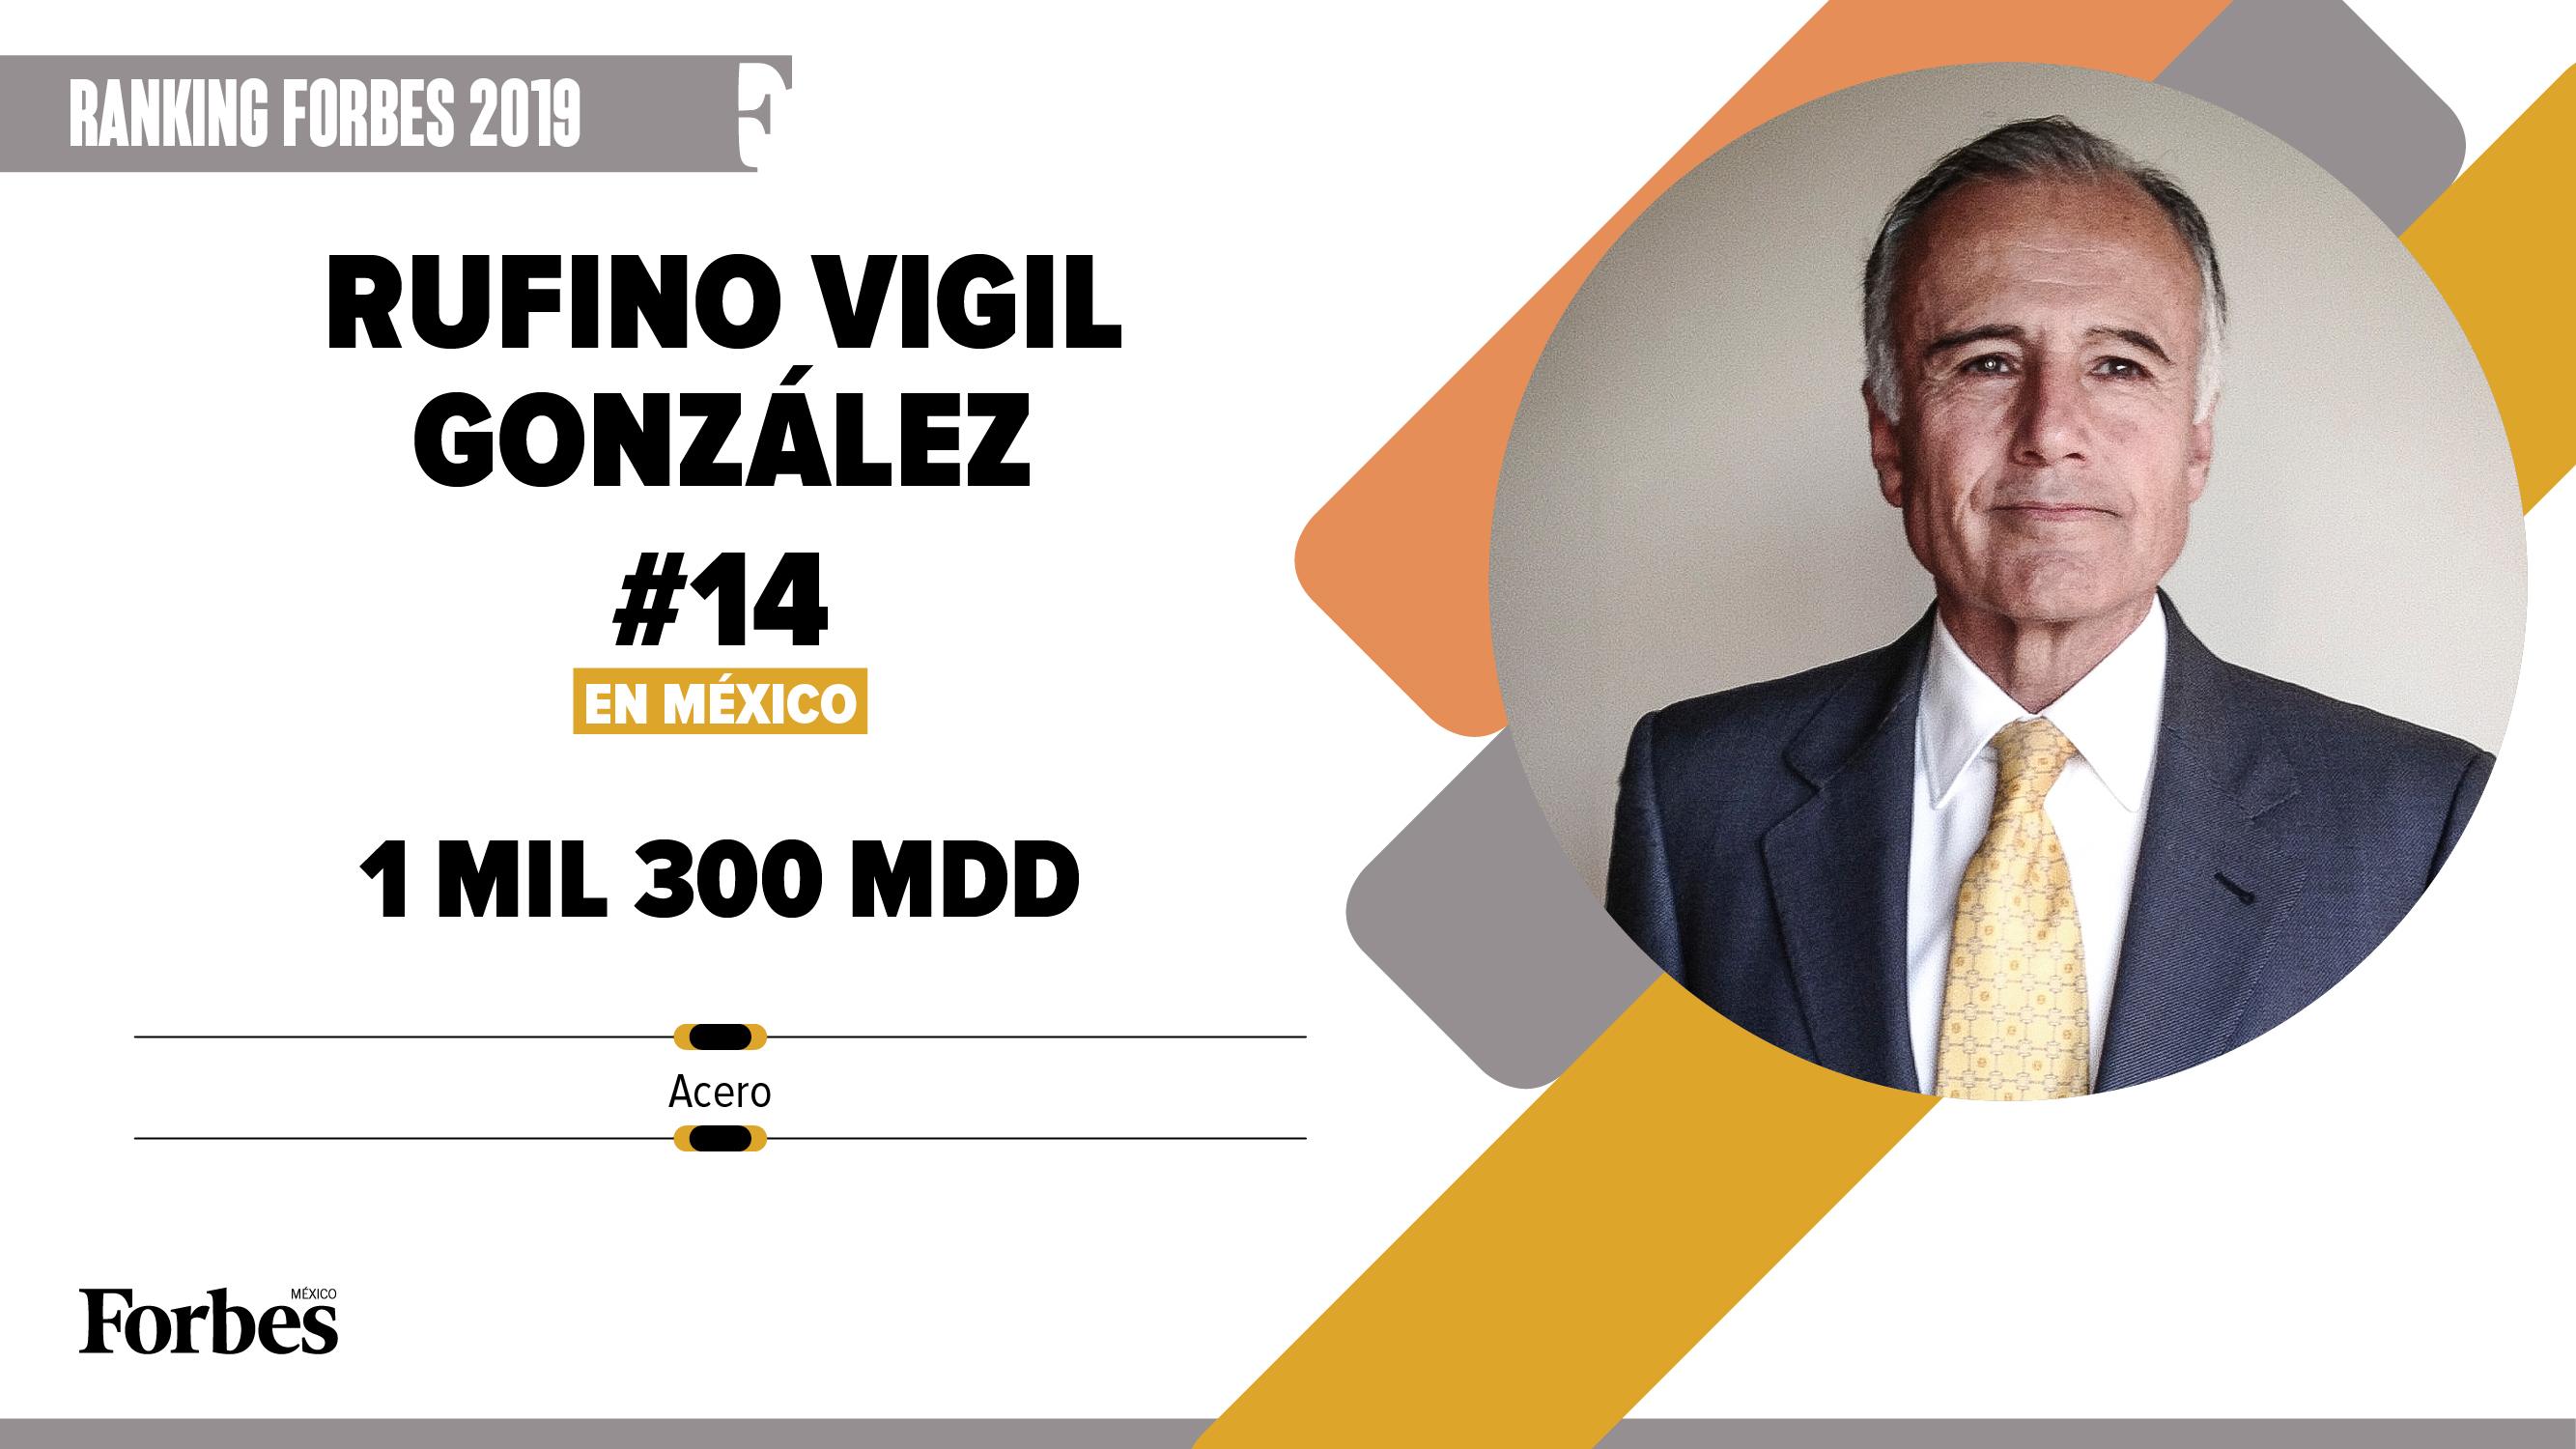 Billionaires 2019 | Rufino Vigil González, no se dobla ni se rompe